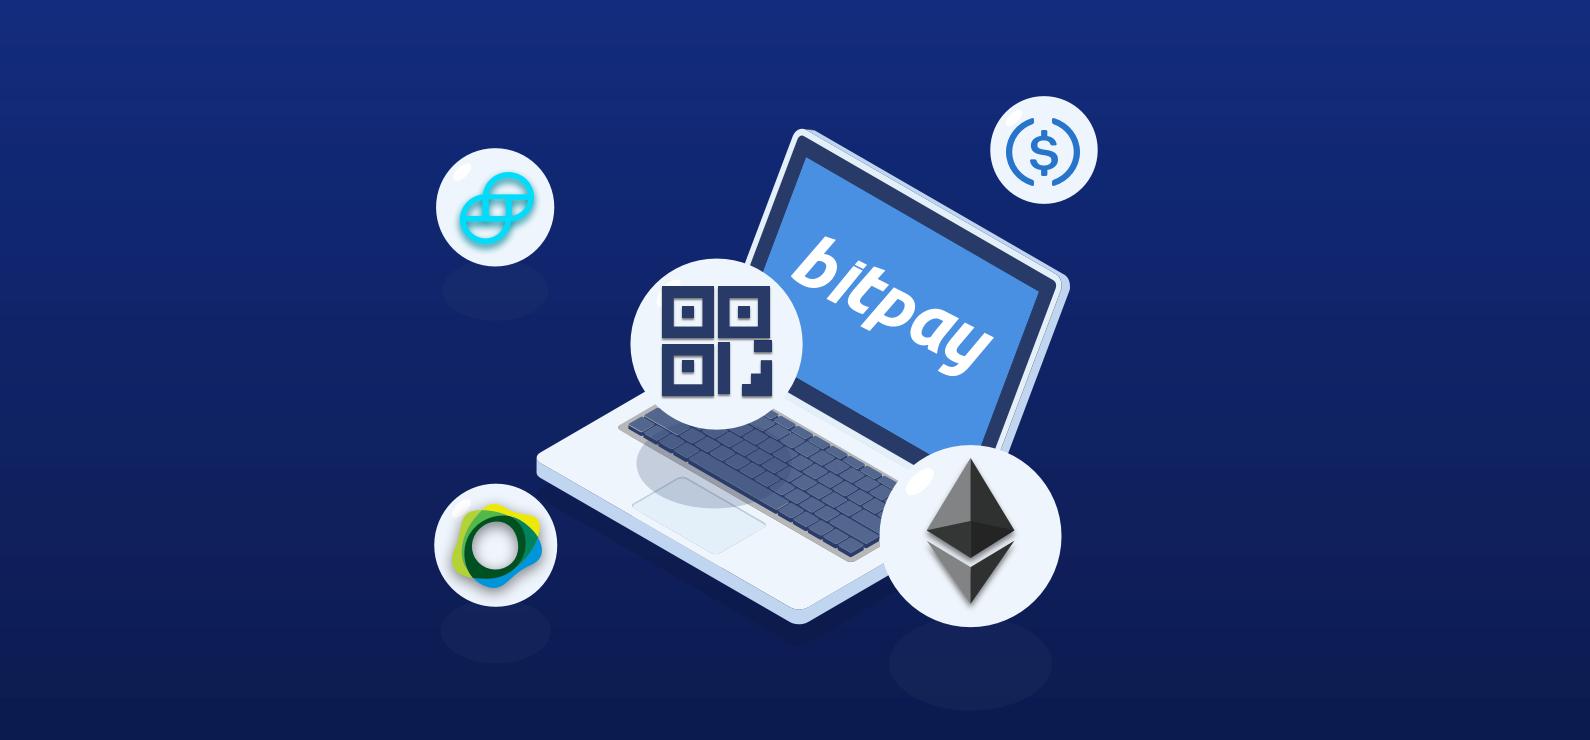 "Los usuarios de Bitpay ahora pueden comprar Crypto con Fiat en la aplicación ""width ="" 1590 ""height ="" 740 ""srcset = ""https://blackswanfinances.com/wp-content/uploads/2020/01/stablecoin_blog_post.png 1590w, https://news.bitcoin.com/wp-content/uploads/2020/01/stablecoin_blog_post-300x140 .png 300w, https://news.bitcoin.com/wp-content/uploads/2020/01/stablecoin_blog_post-1024x477.png 1024w, https://news.bitcoin.com/wp-content/uploads/2020/01 /stablecoin_blog_post-768x357.png 768w, https://news.bitcoin.com/wp-content/uploads/2020/01/stablecoin_blog_post-1536x715.png 1536w, https://news.bitcoin.com/wp-content/uploads /2020/01/stablecoin_blog_post-696x324.png 696w, https://news.bitcoin.com/wp-content/uploads/2020/01/stablecoin_blog_post-1392x648.png 1392w, https://news.bitcoin.com/wp -content / uploads / 2020/01 / stablecoin_blog_post-1068x497.png 1068w, https://news.bitcoin.com/wp-content/uploads/ 2020/01 / stablecoin_blog_post-902x420.png 902w ""tamaños ="" (ancho máximo: 1590px) 100vw, 1590px"